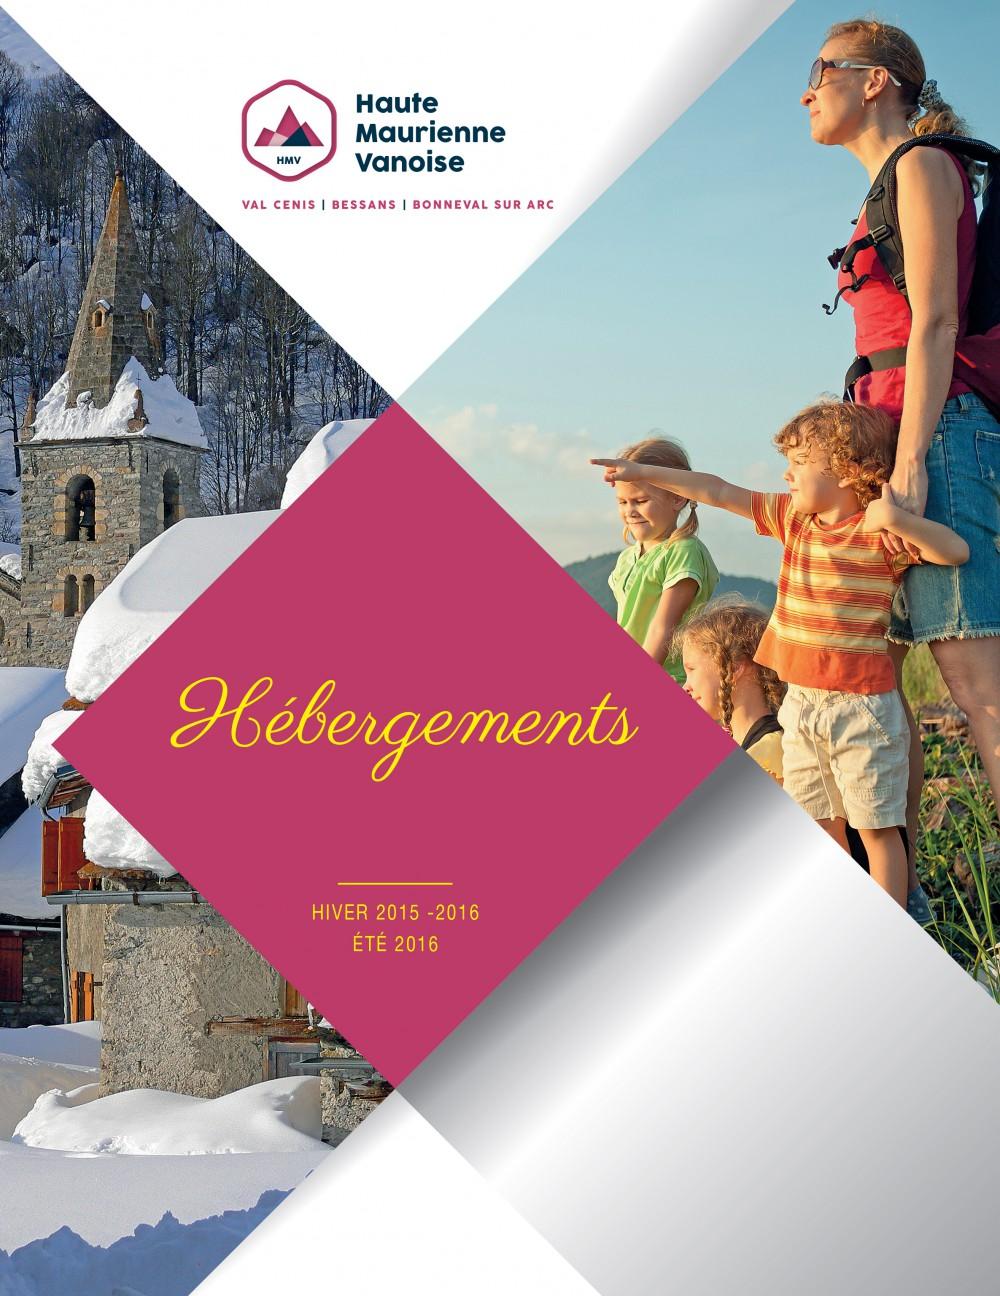 Haute maurienne vanoise une r f rence tourisme loisirs for Haute maurienne